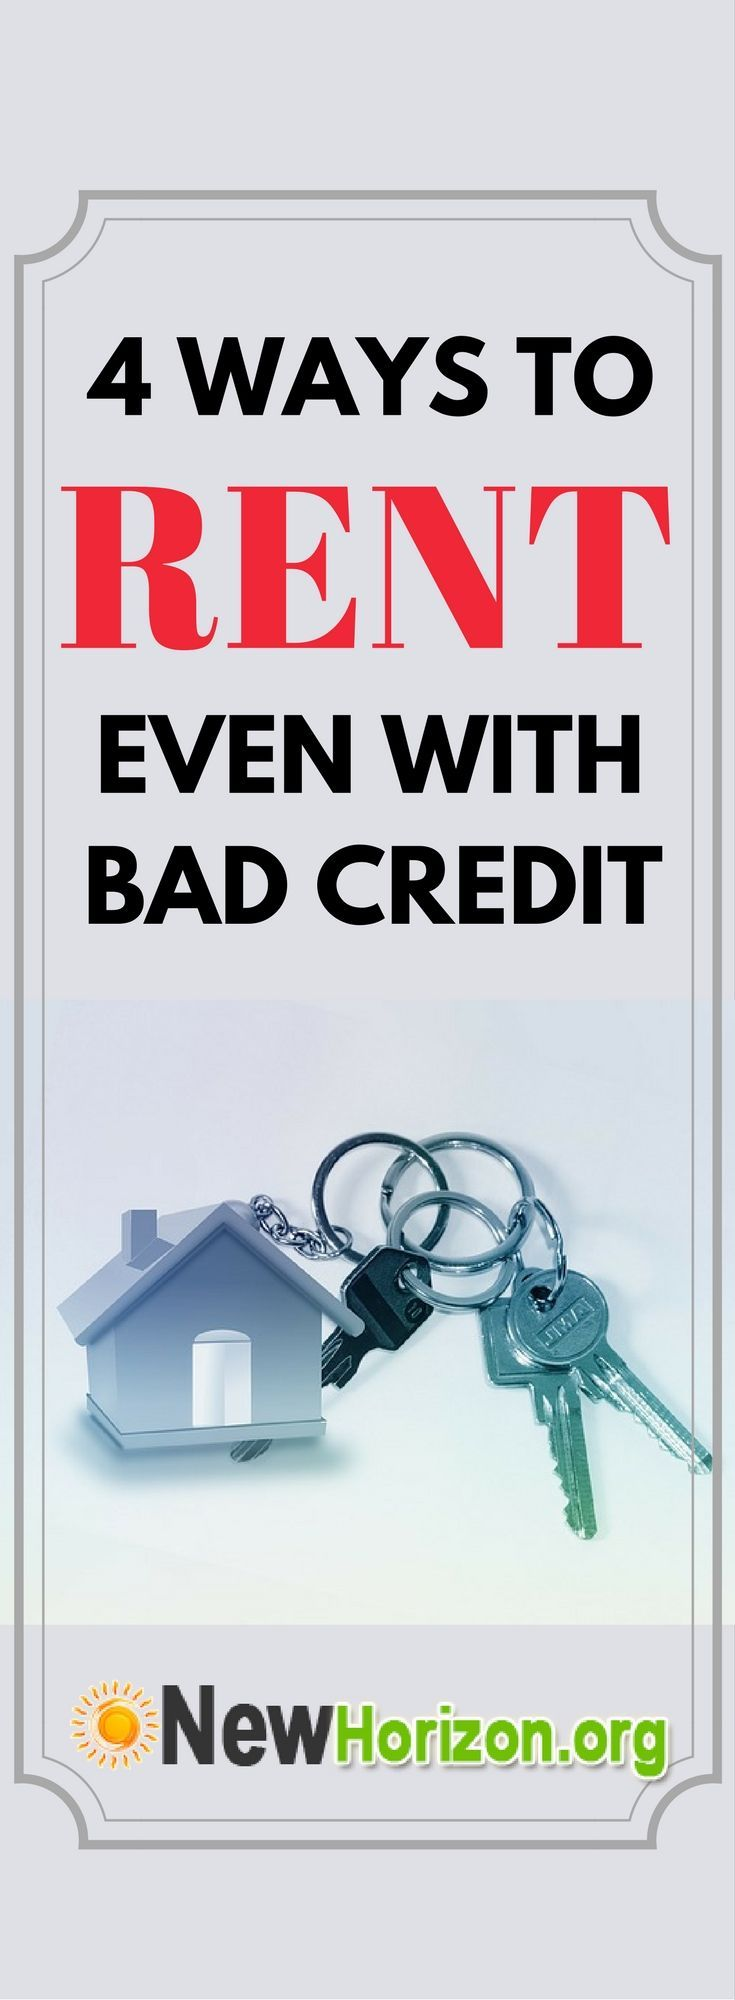 710d4c792074d2d19dd059471717ec4c - How To Get A Rental With Bad Rental History